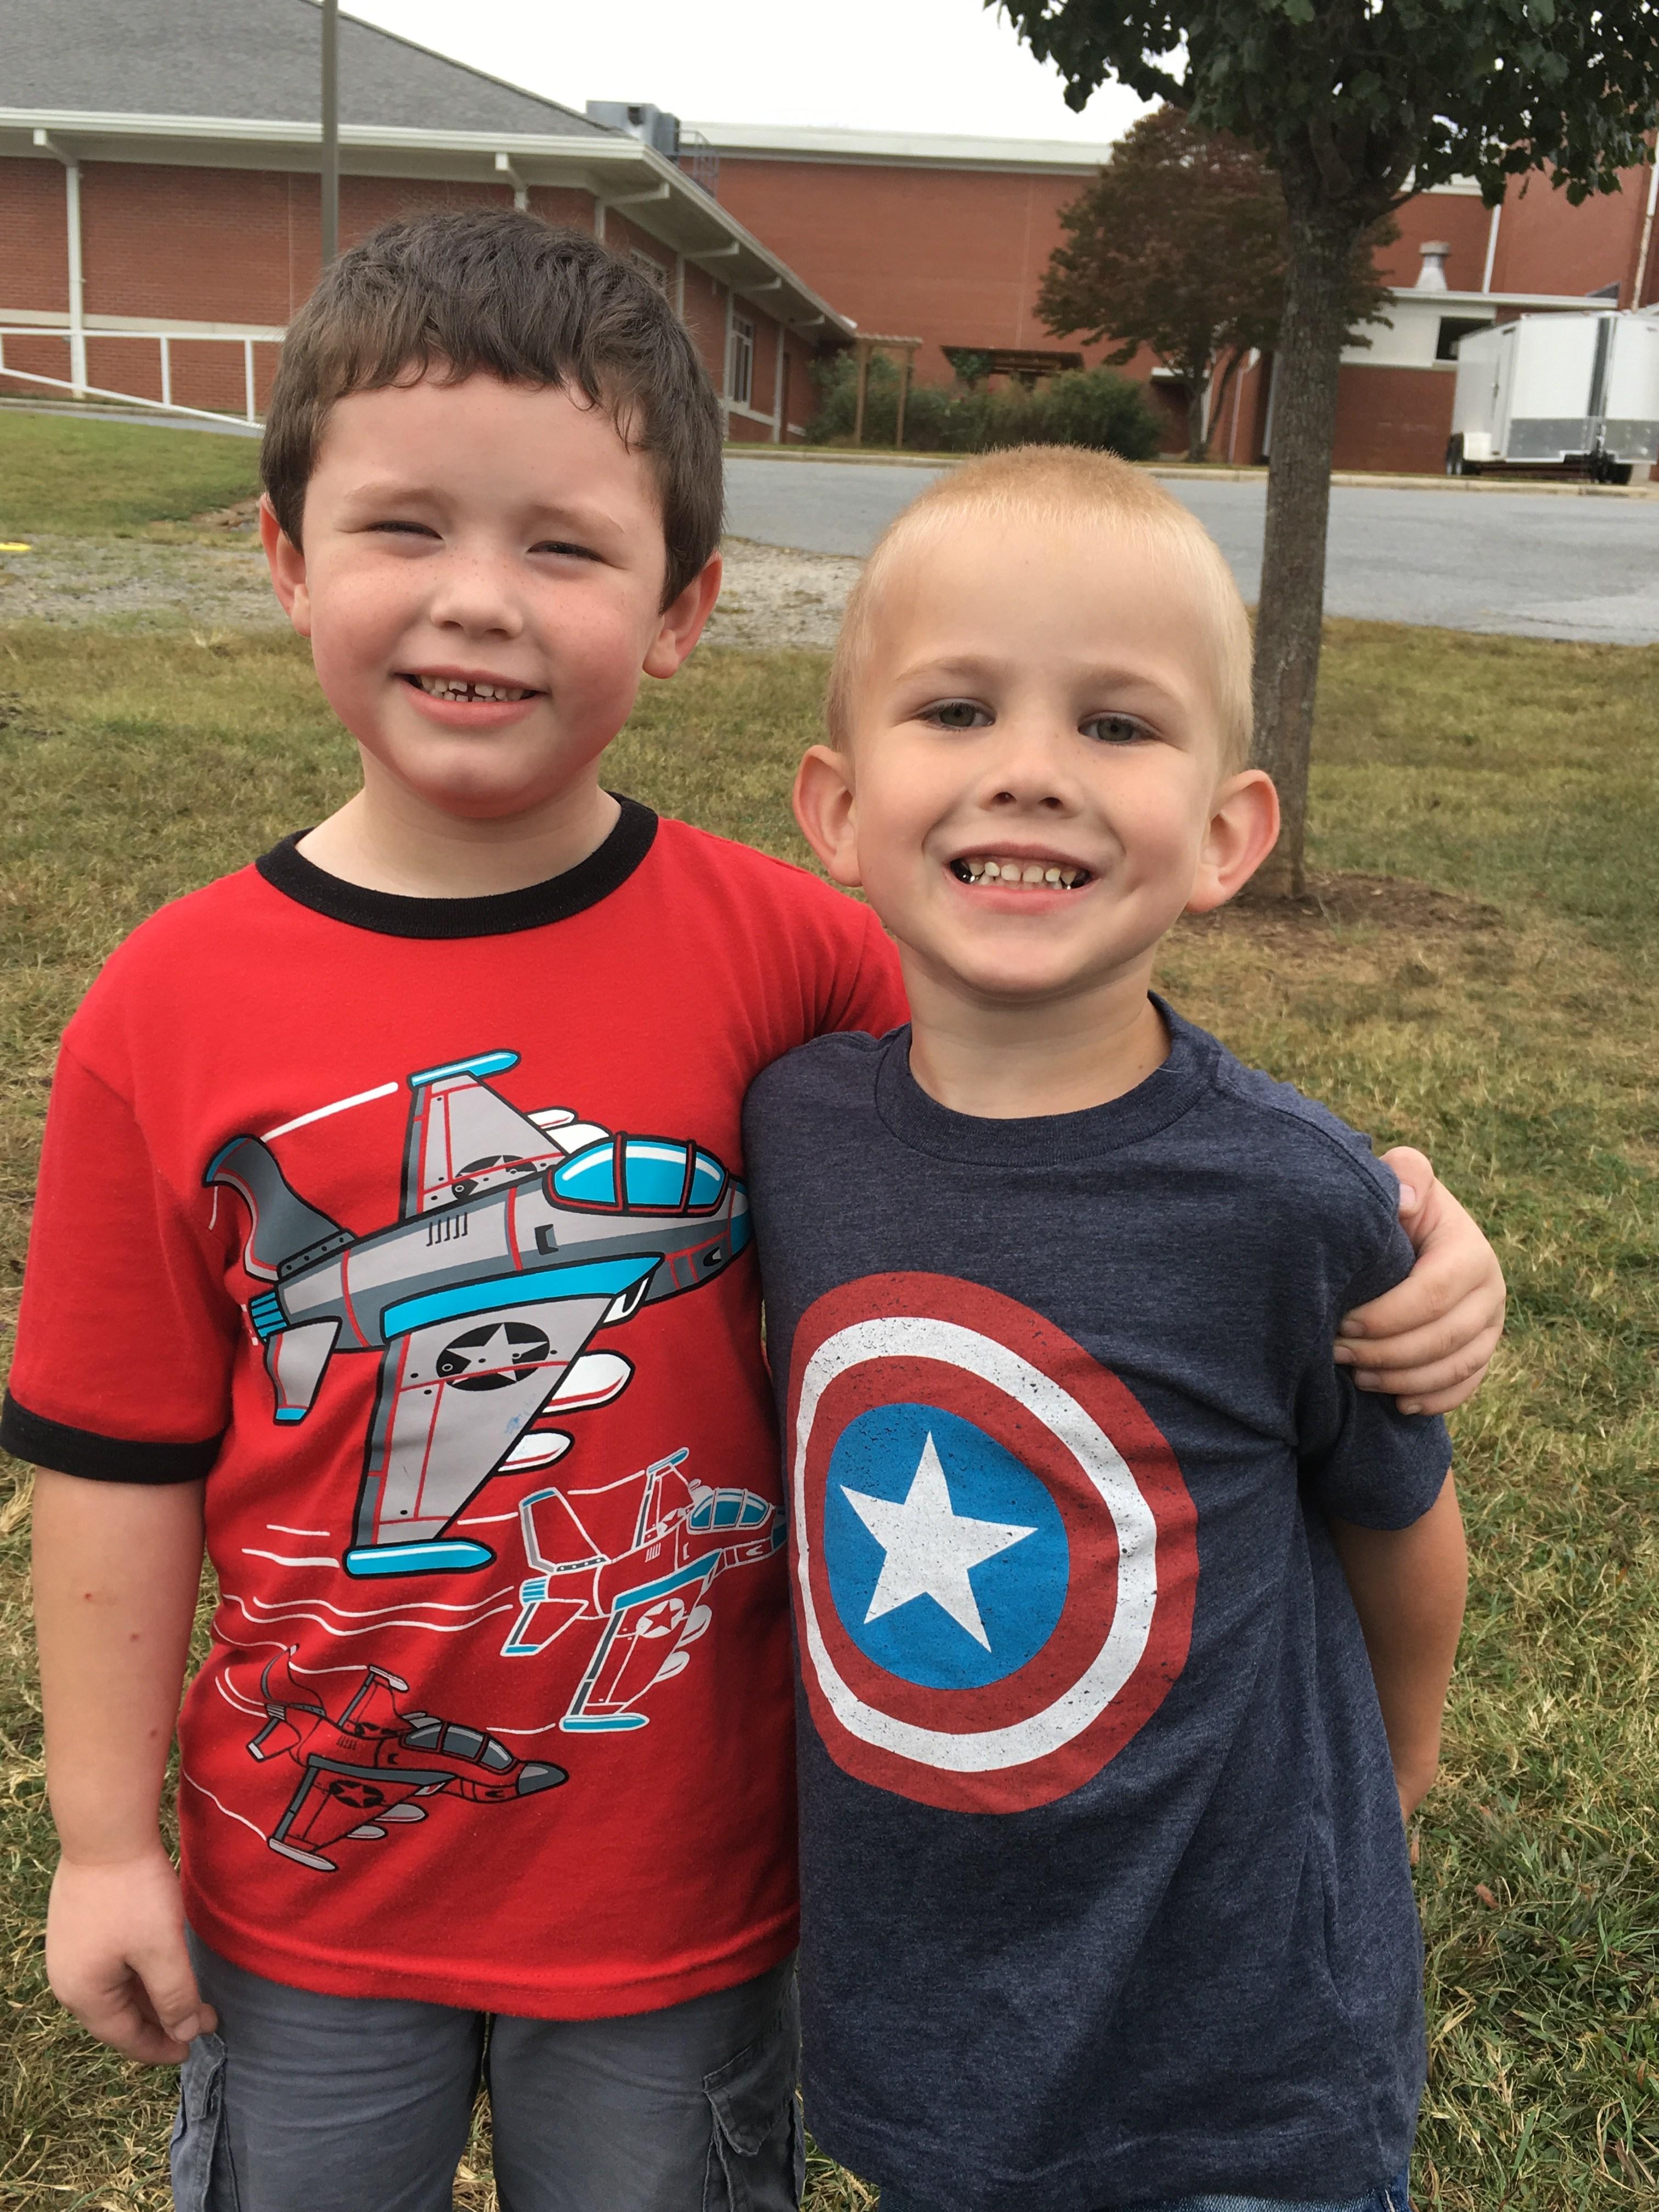 two friends dressed as superheroes